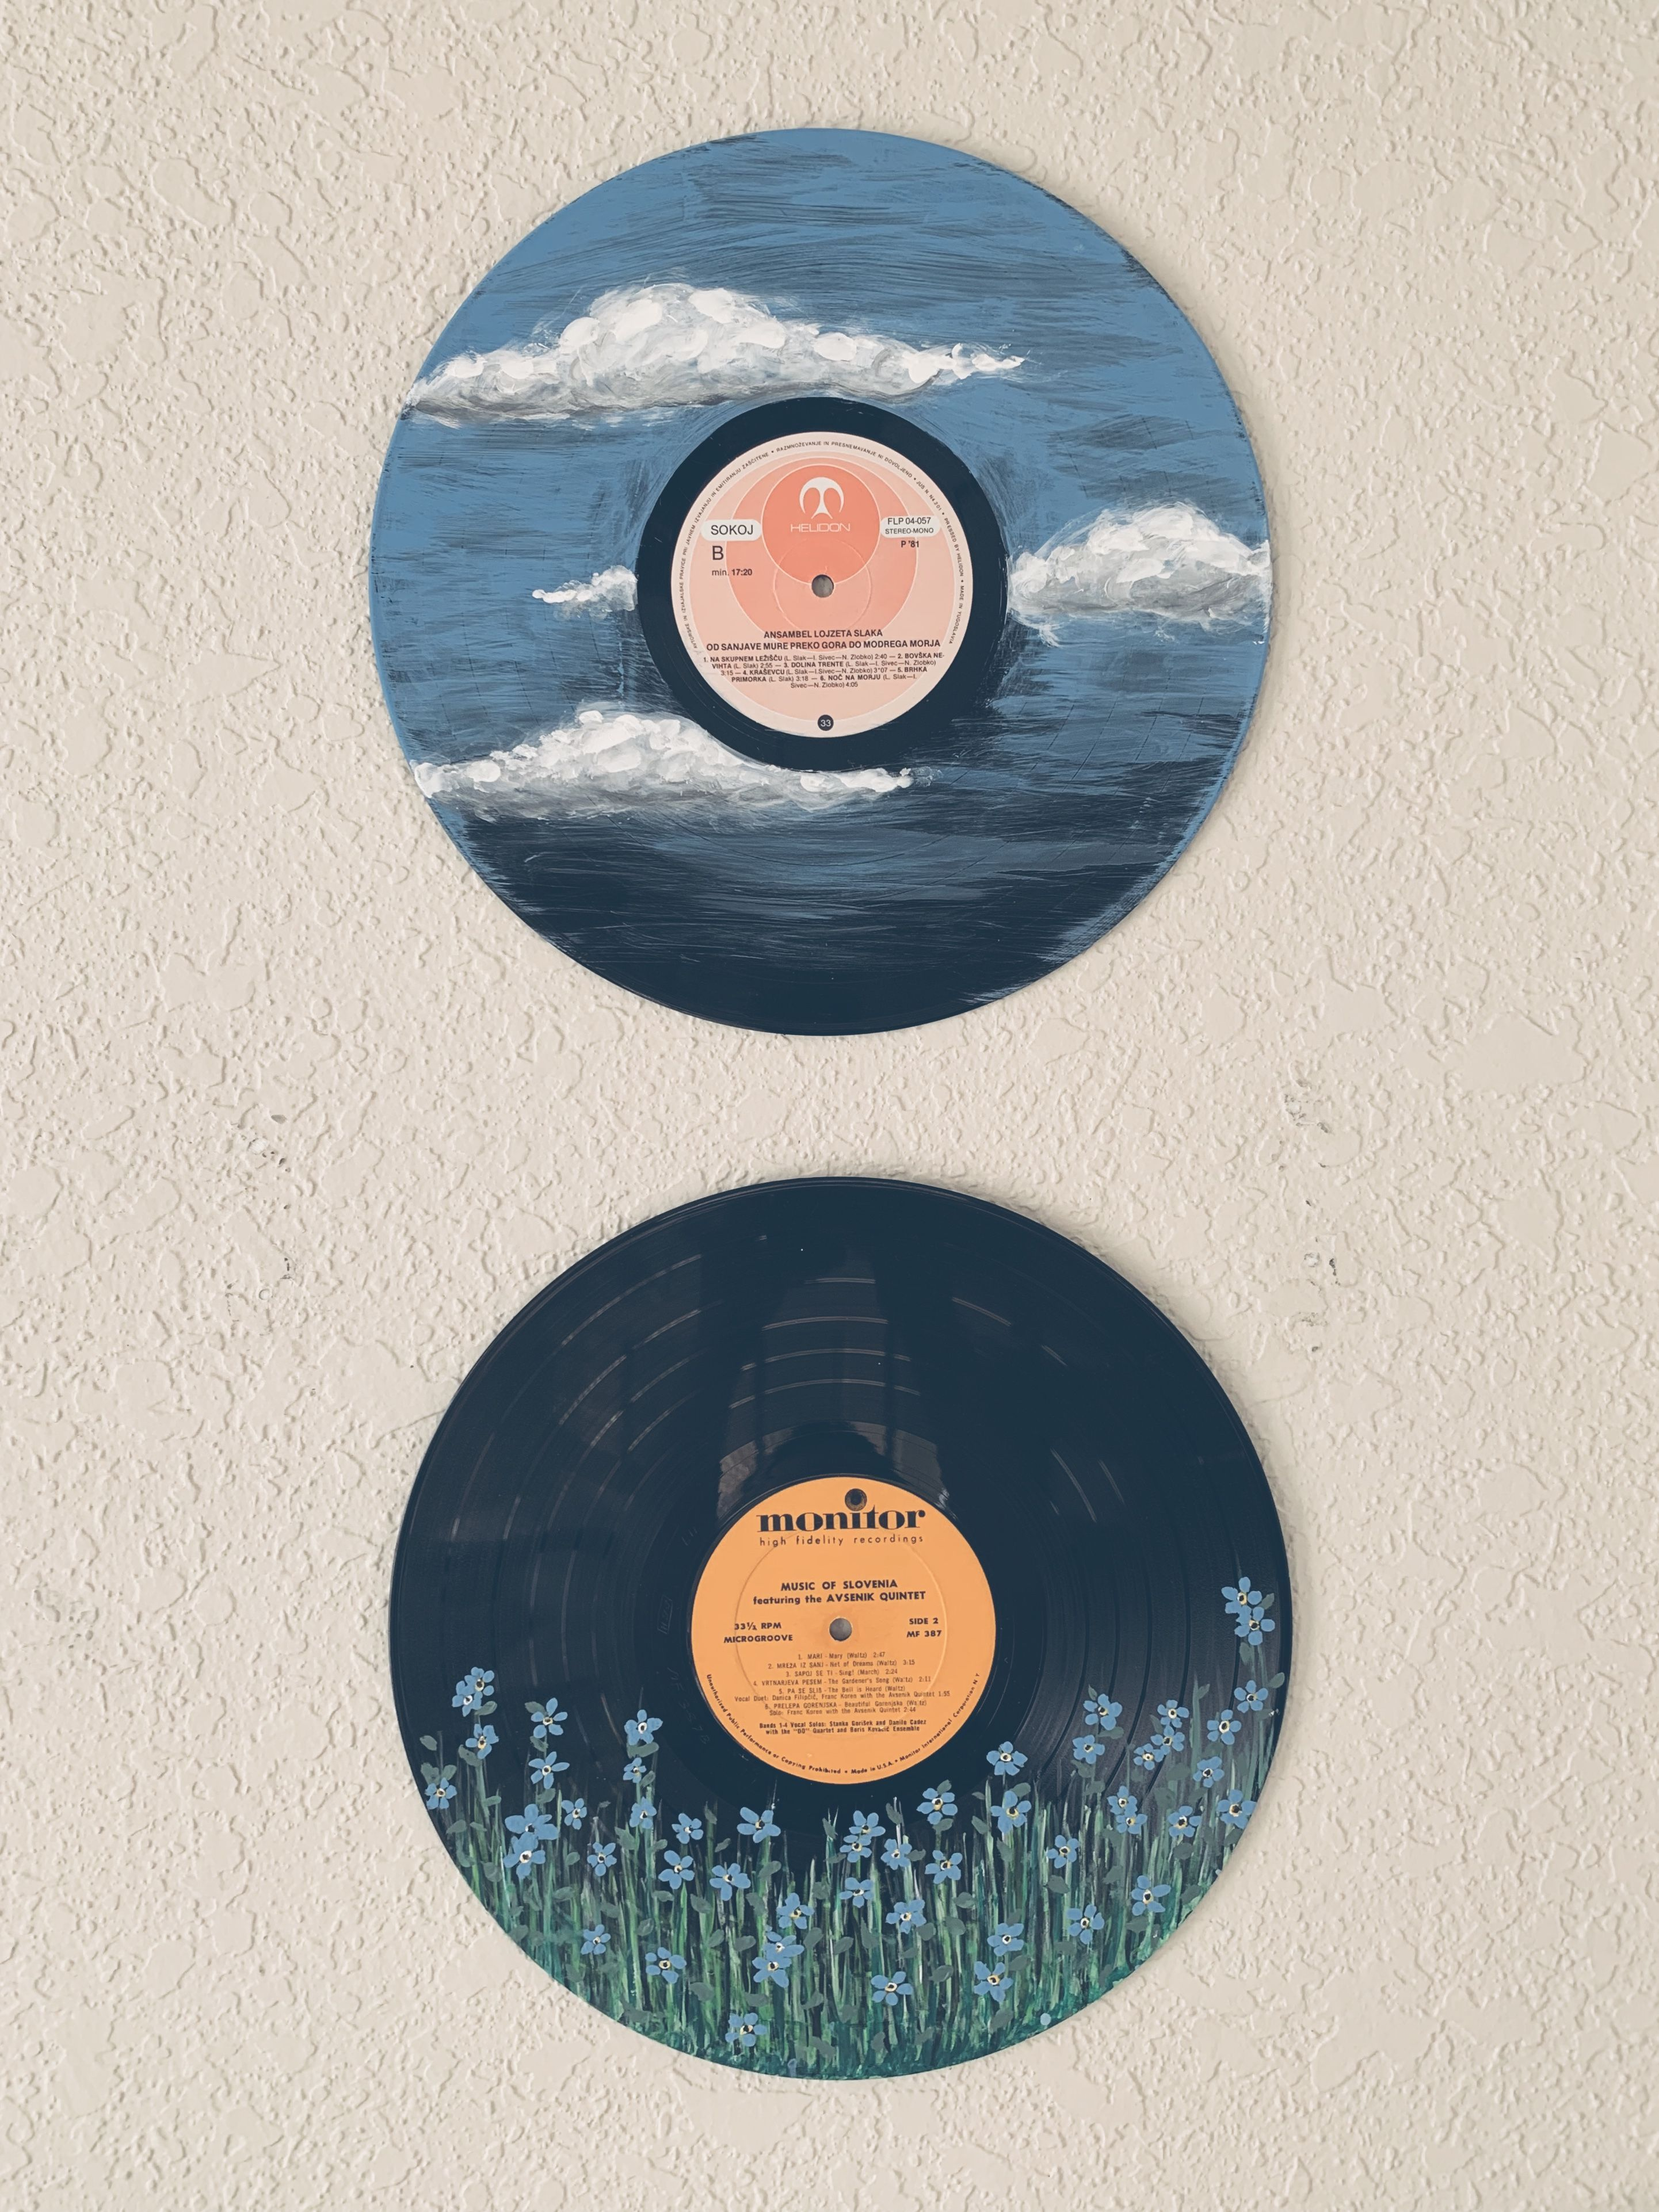 Vinyl Acrylic Painting 1001 Kreative Und Nutzliche Upcycling Ideen Zur Inspirationupcycling Ideen In 2020 Vinyl Record Art Mountain Painting Acrylic Vinyl Art Paint